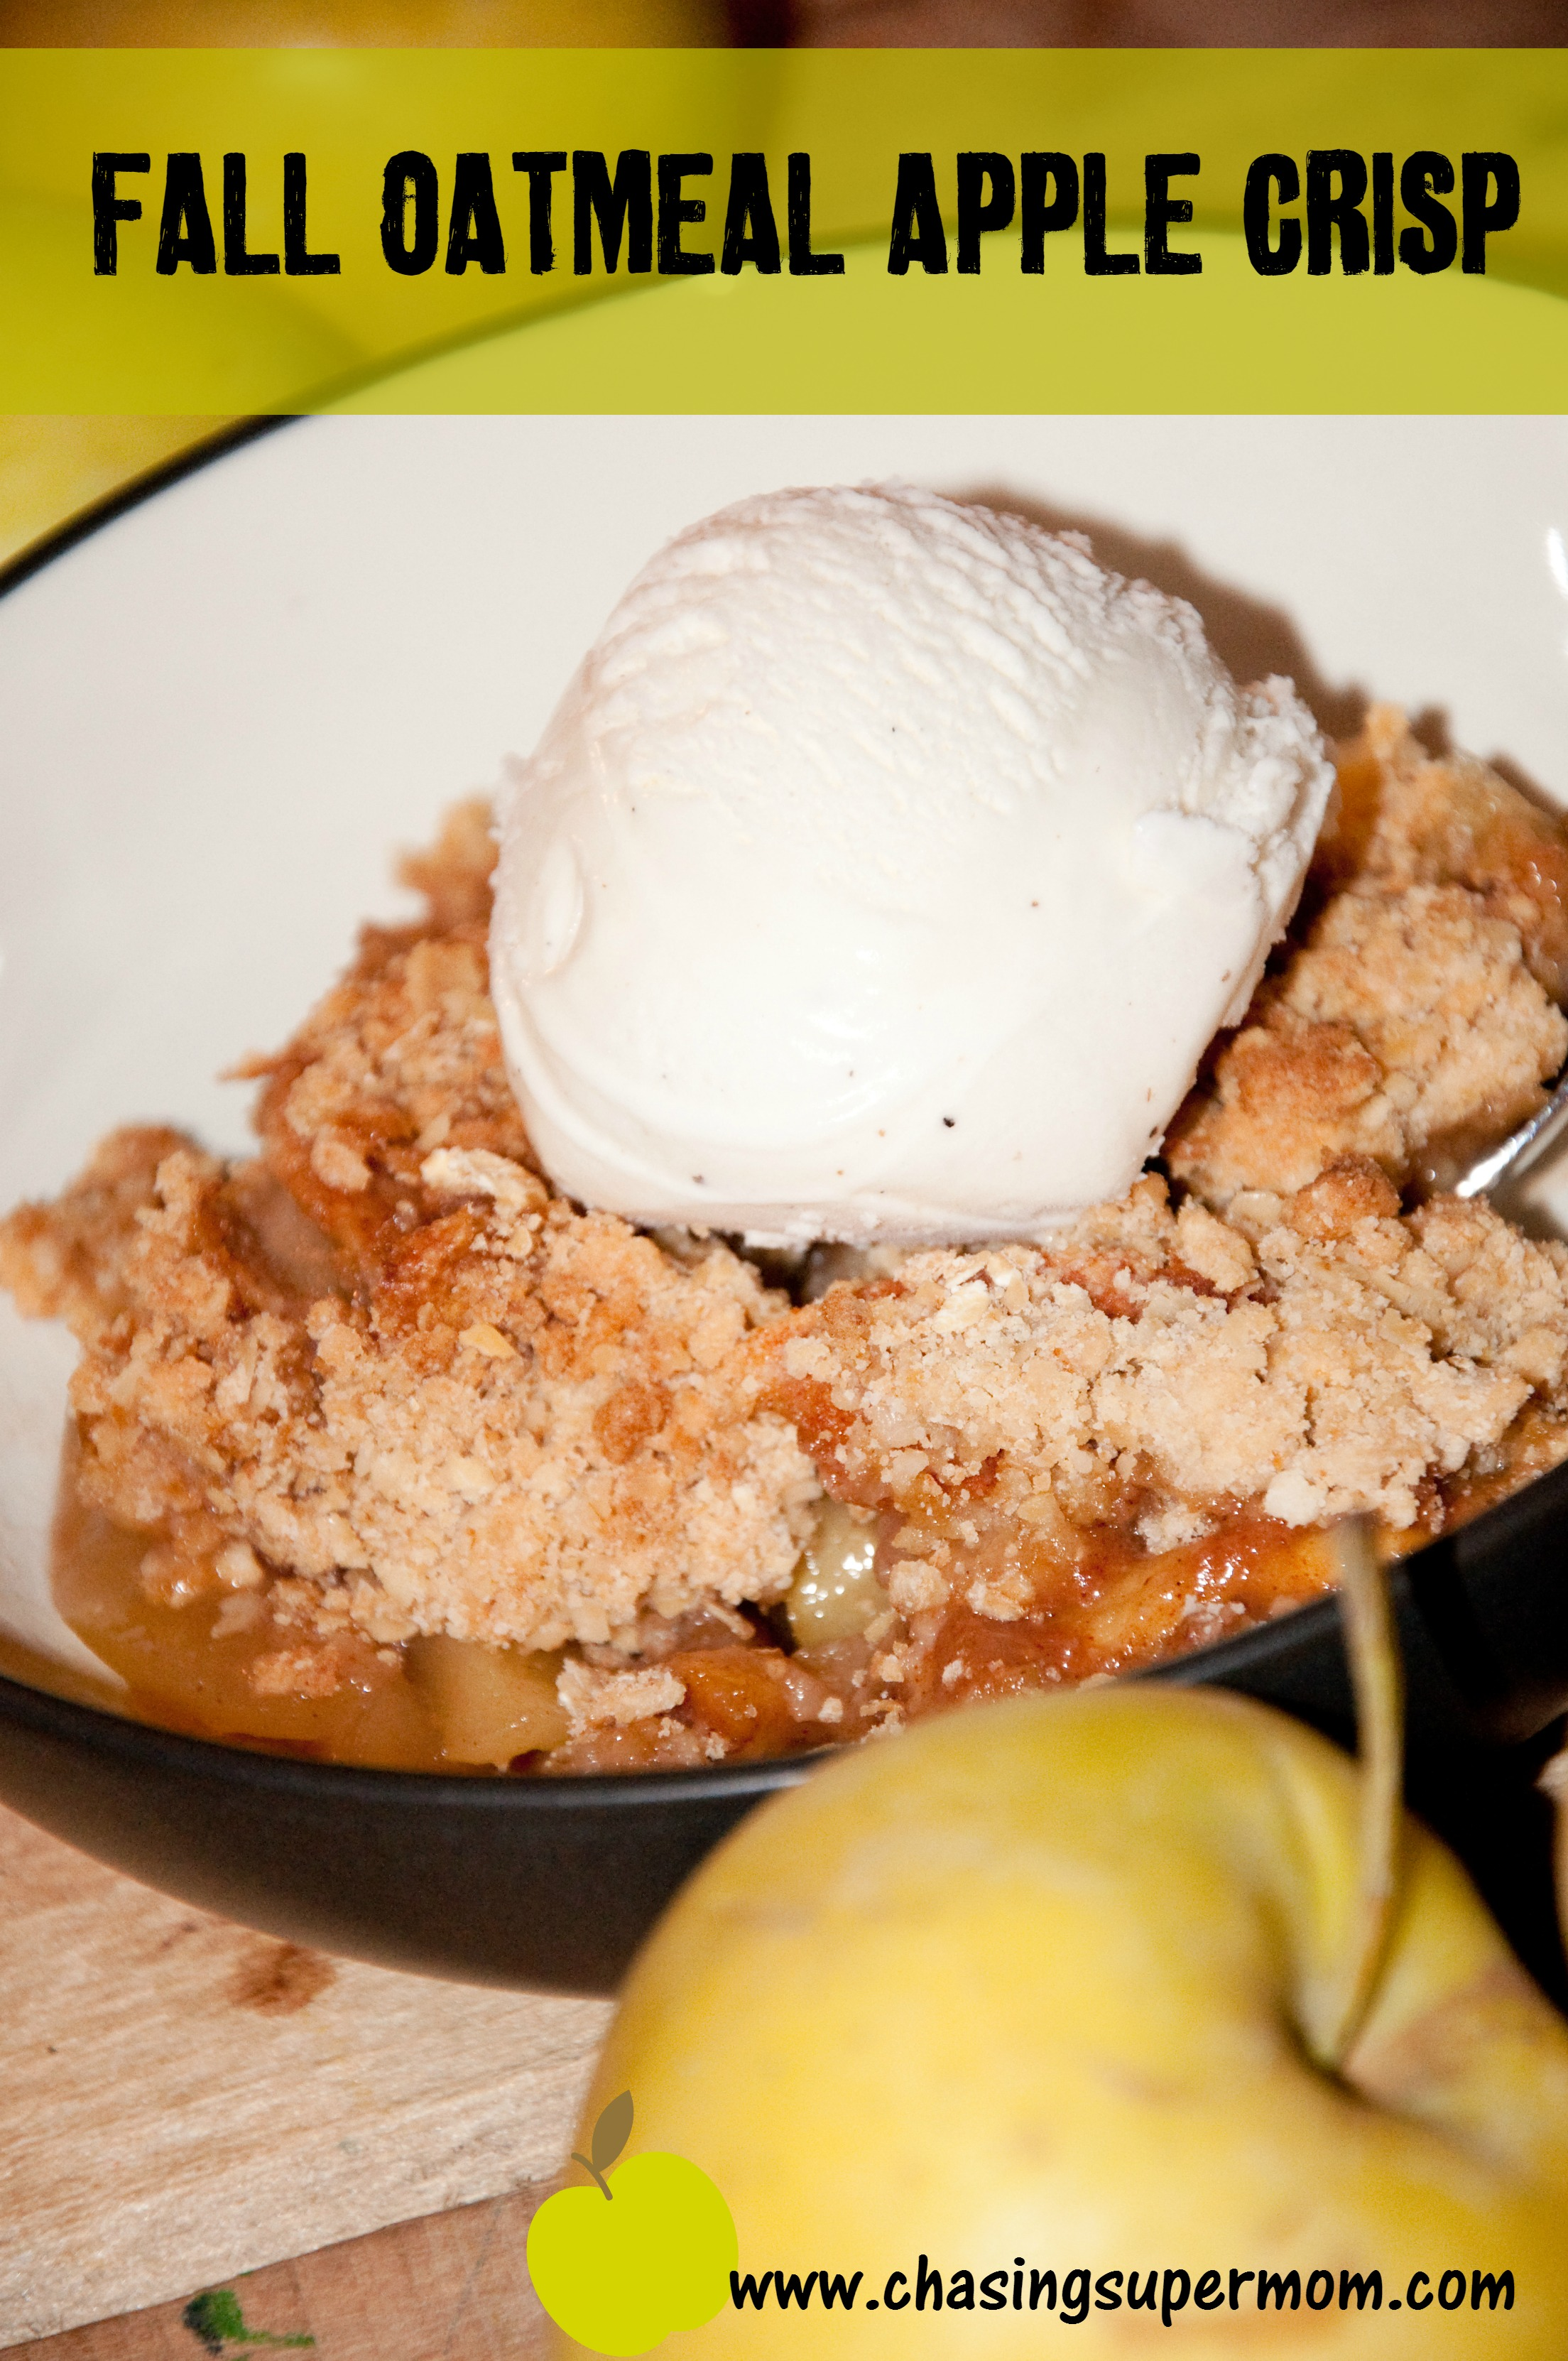 Fall Oatmeal Apple Crisp